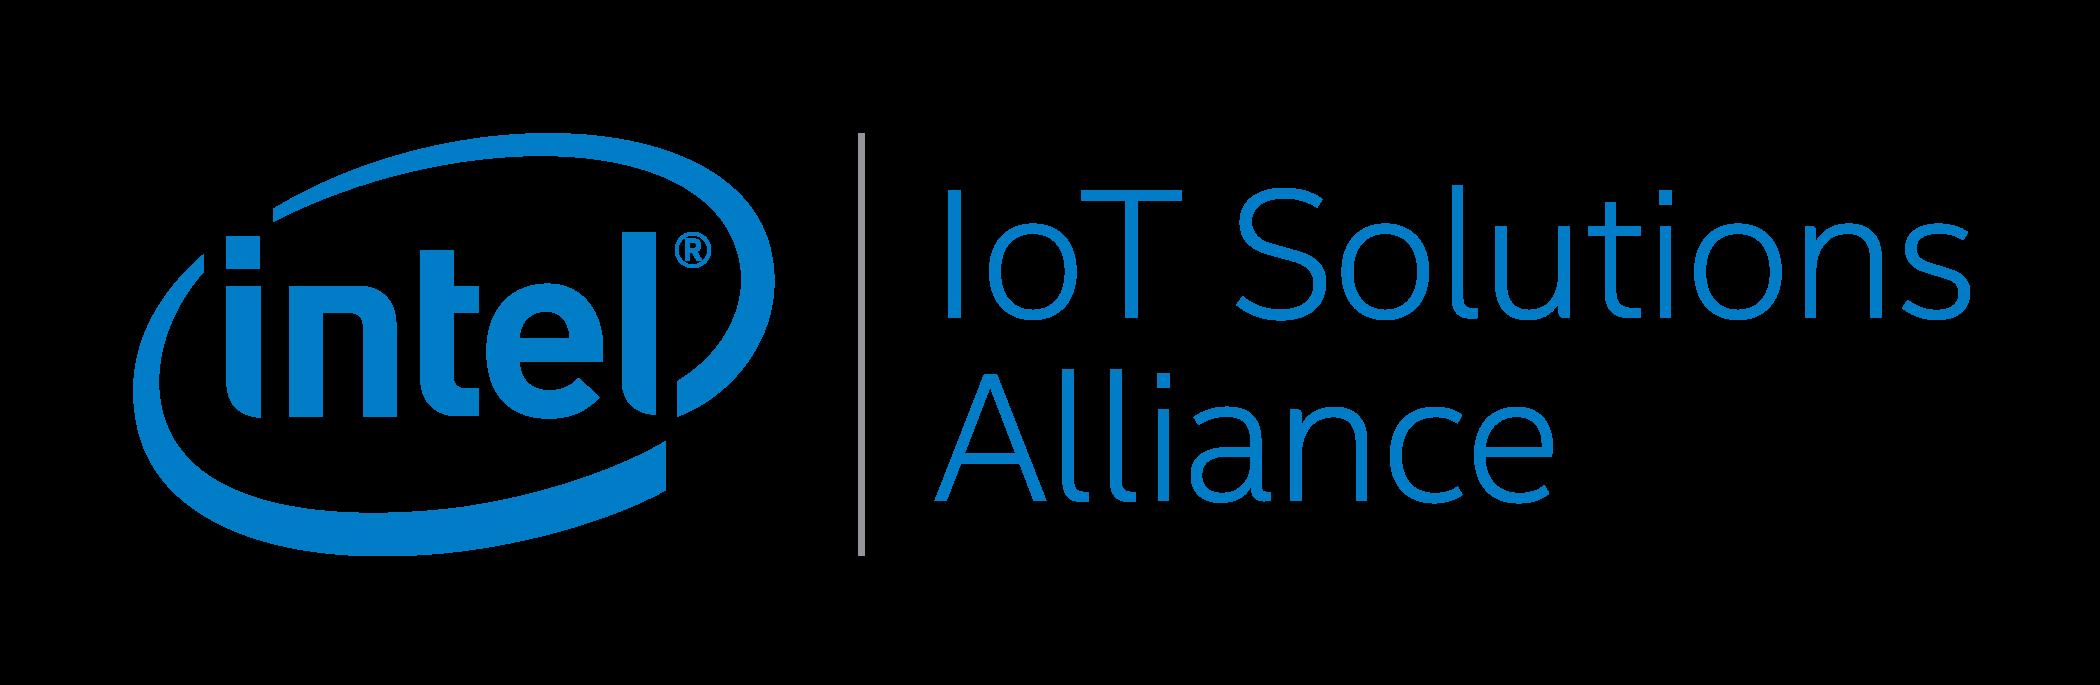 IOT Solutions Alliance